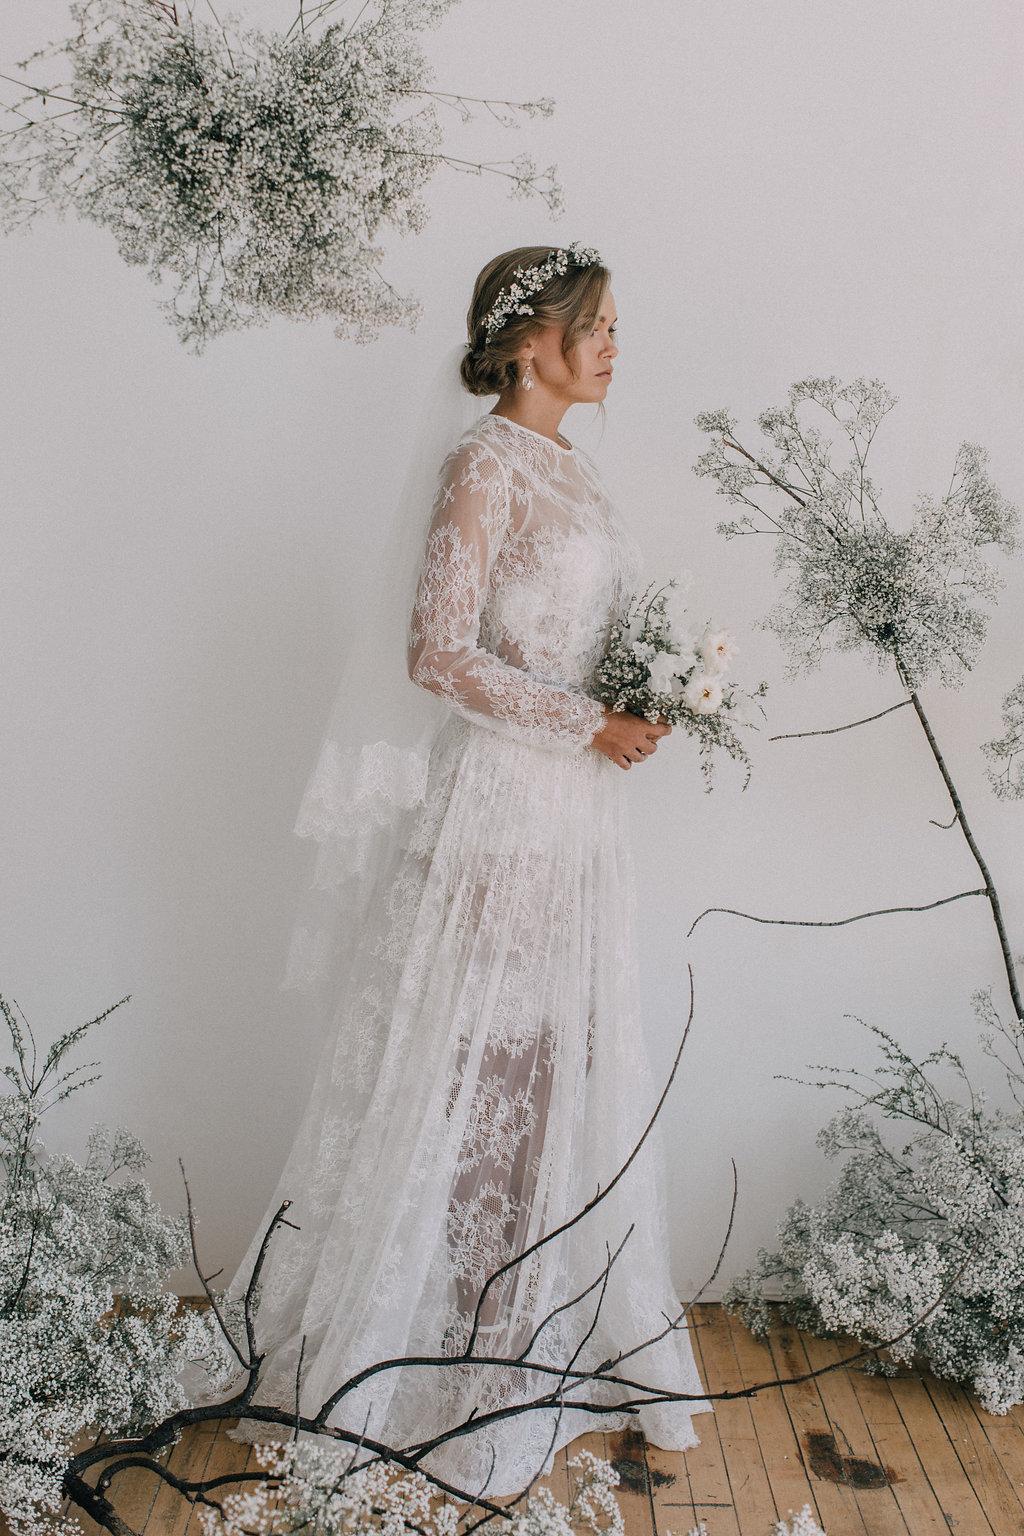 engle-olson-lady-vamp-look-book-jenna-mahr-photography-17.jpg